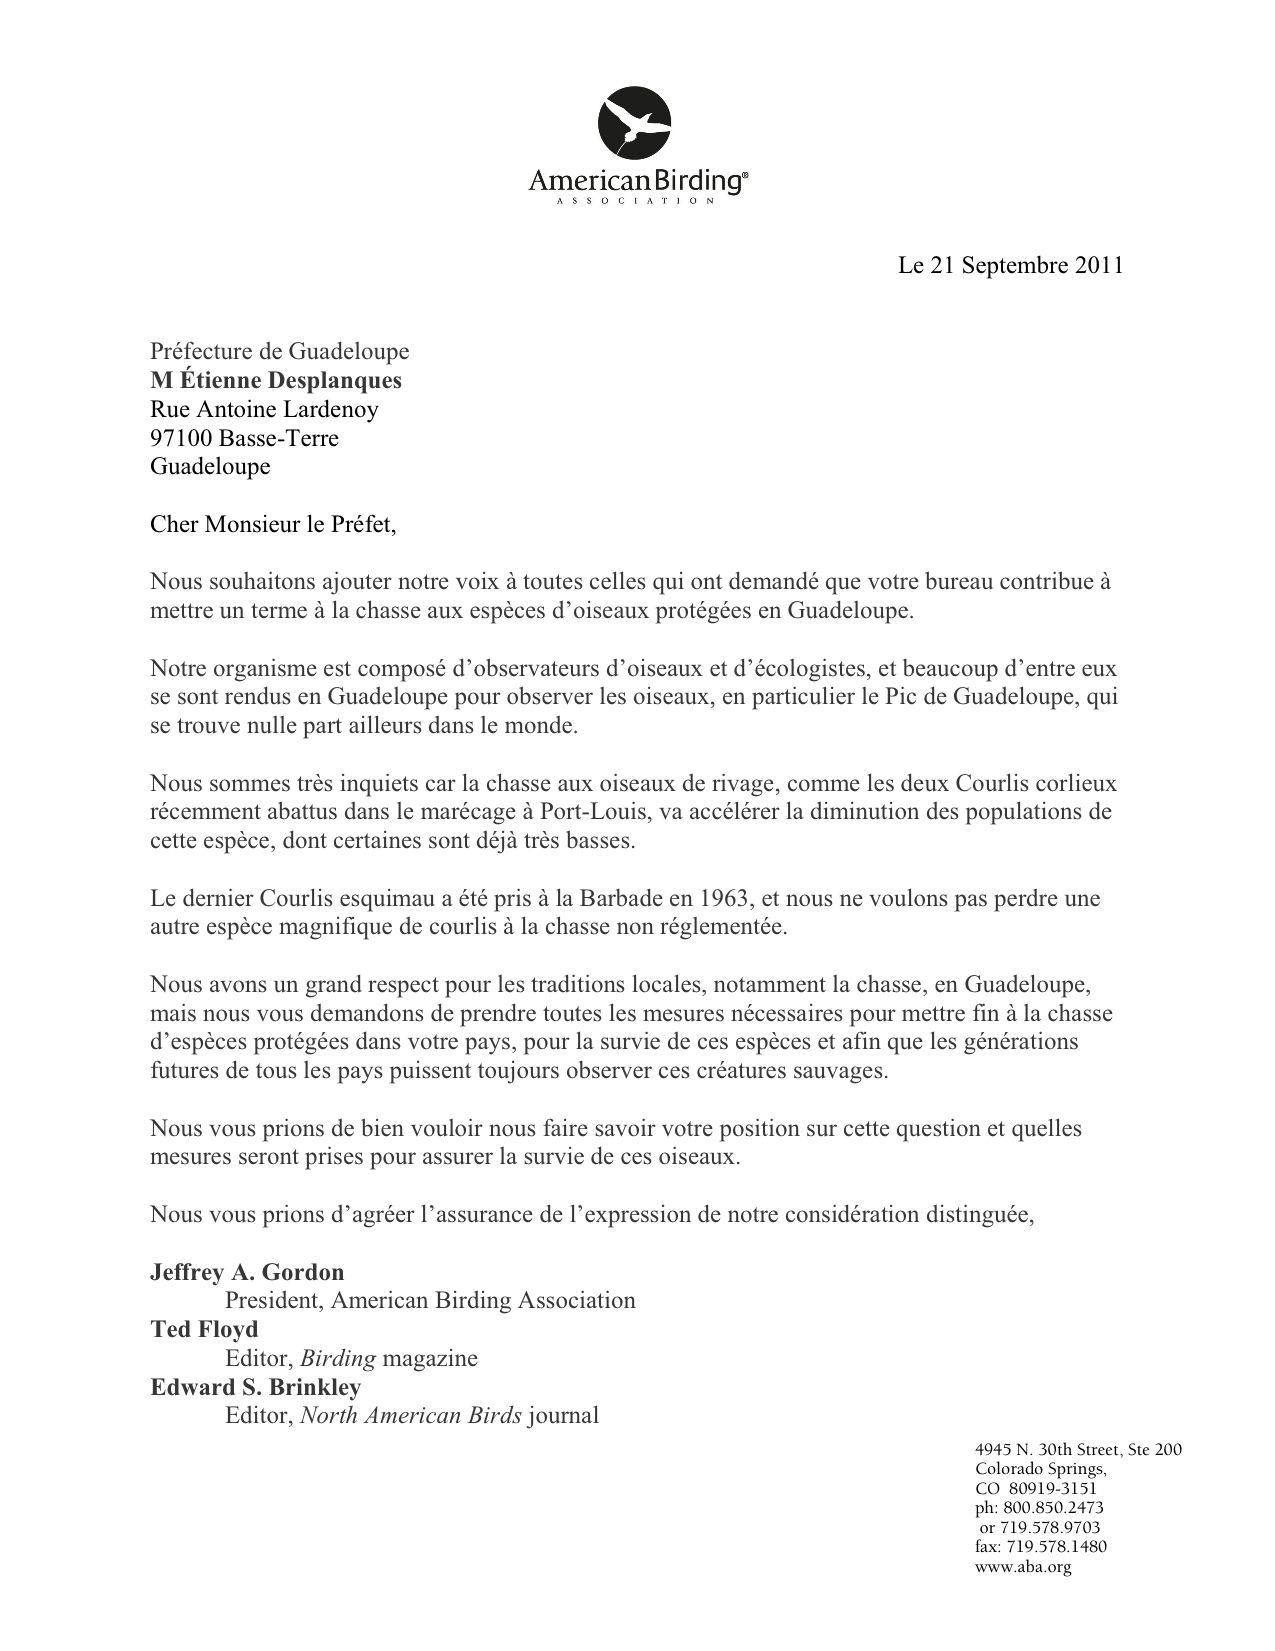 ABA Blog Conservation HDWarning Letter For Absent